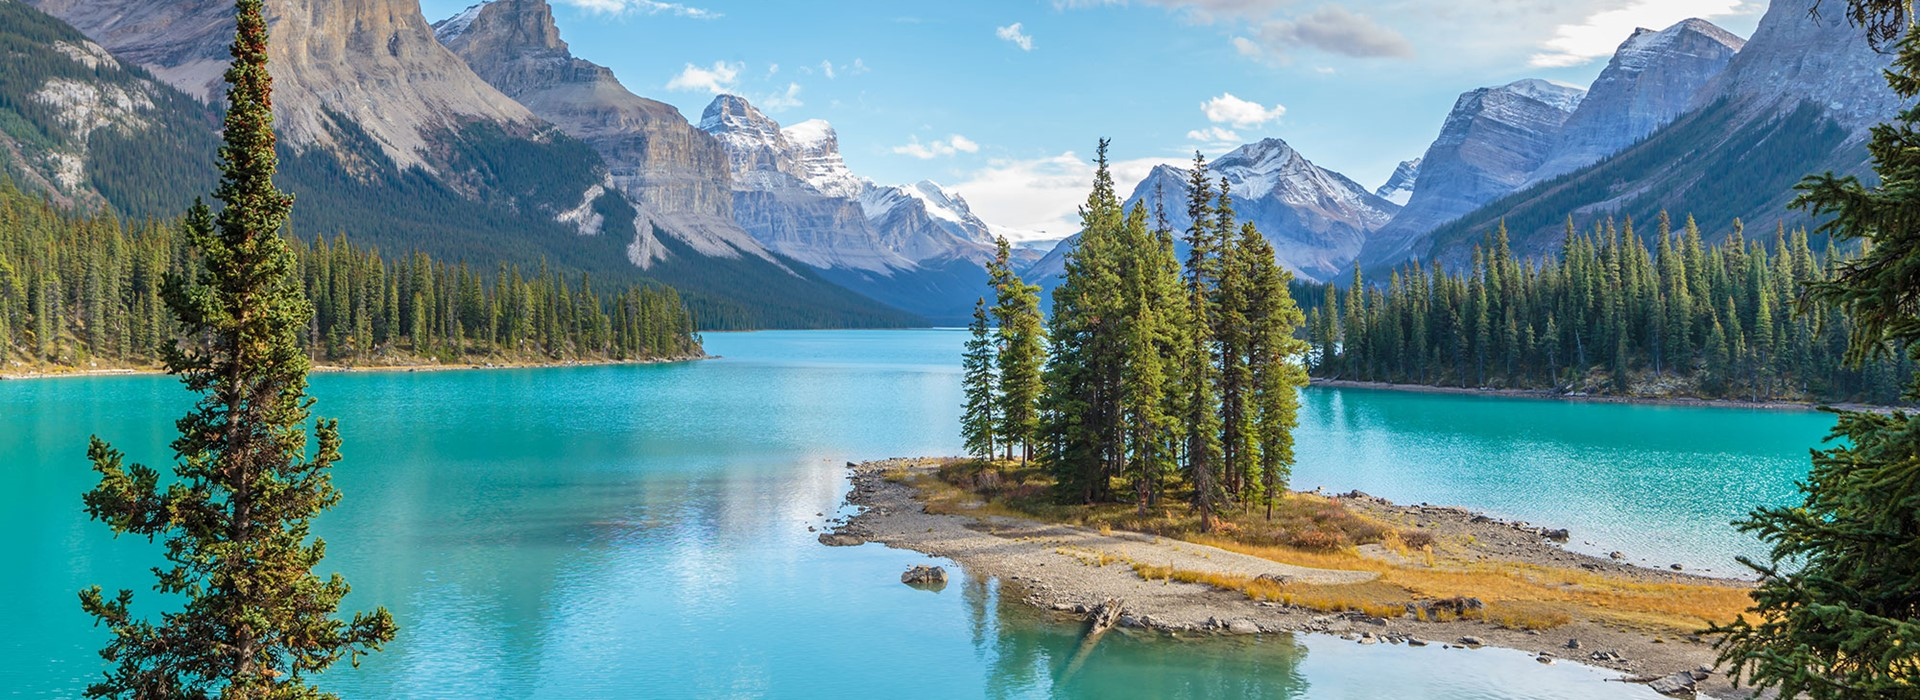 Canada's Rocky Mountaineer